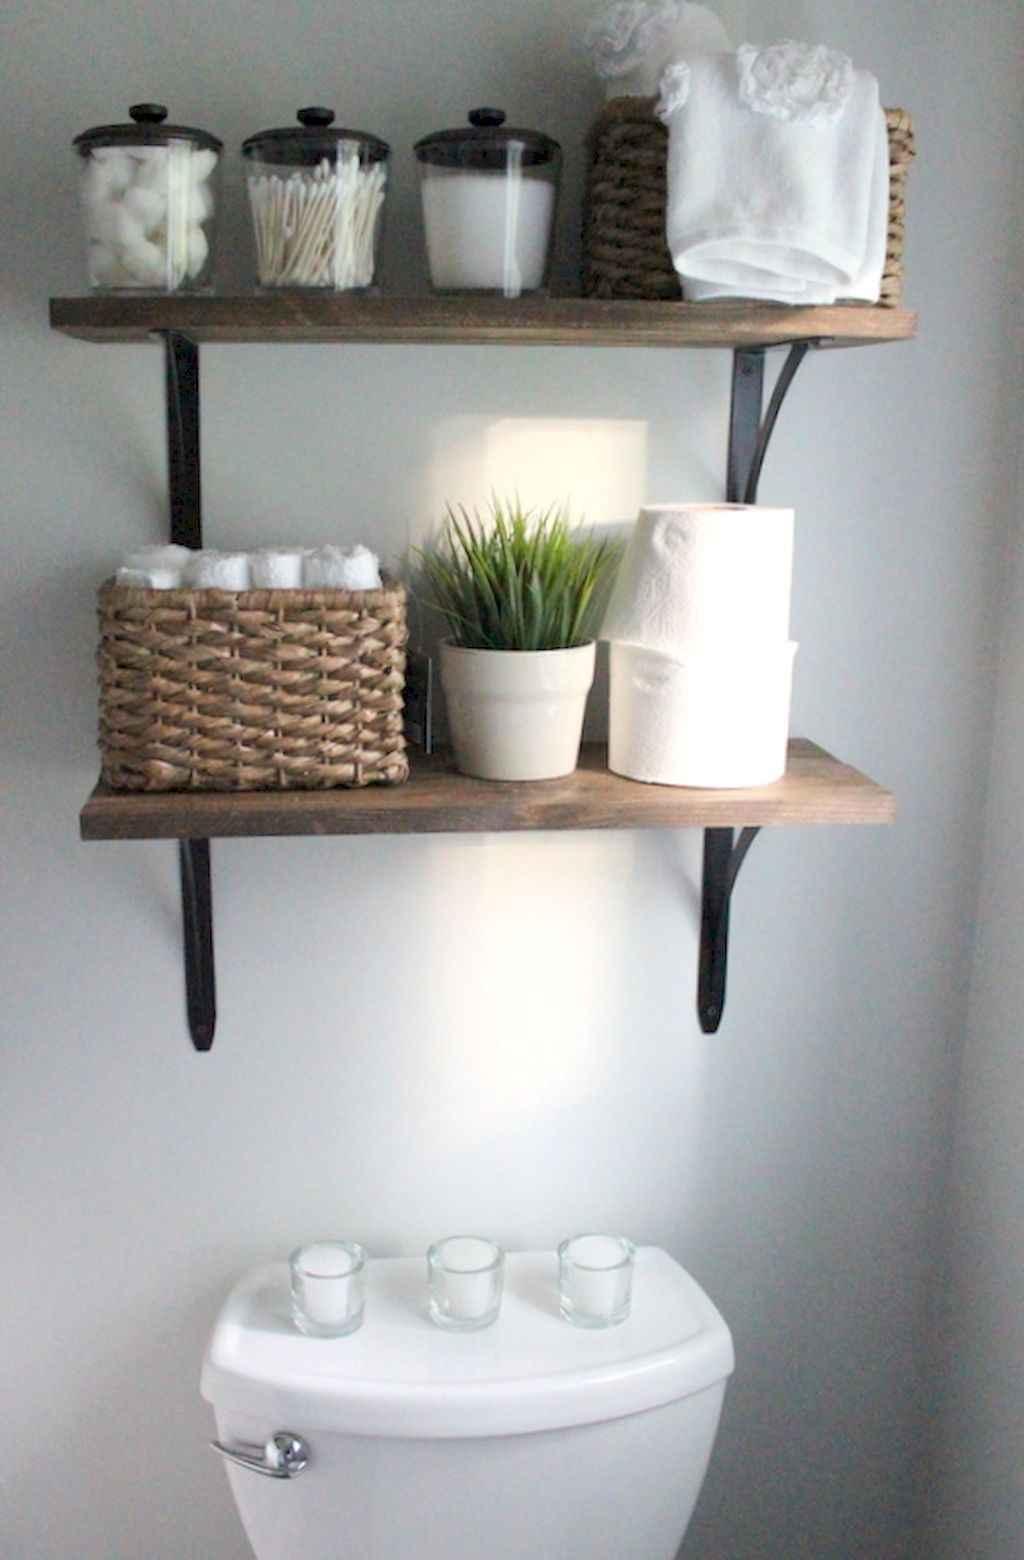 Cool bathroom storage shelves organization ideas (38)